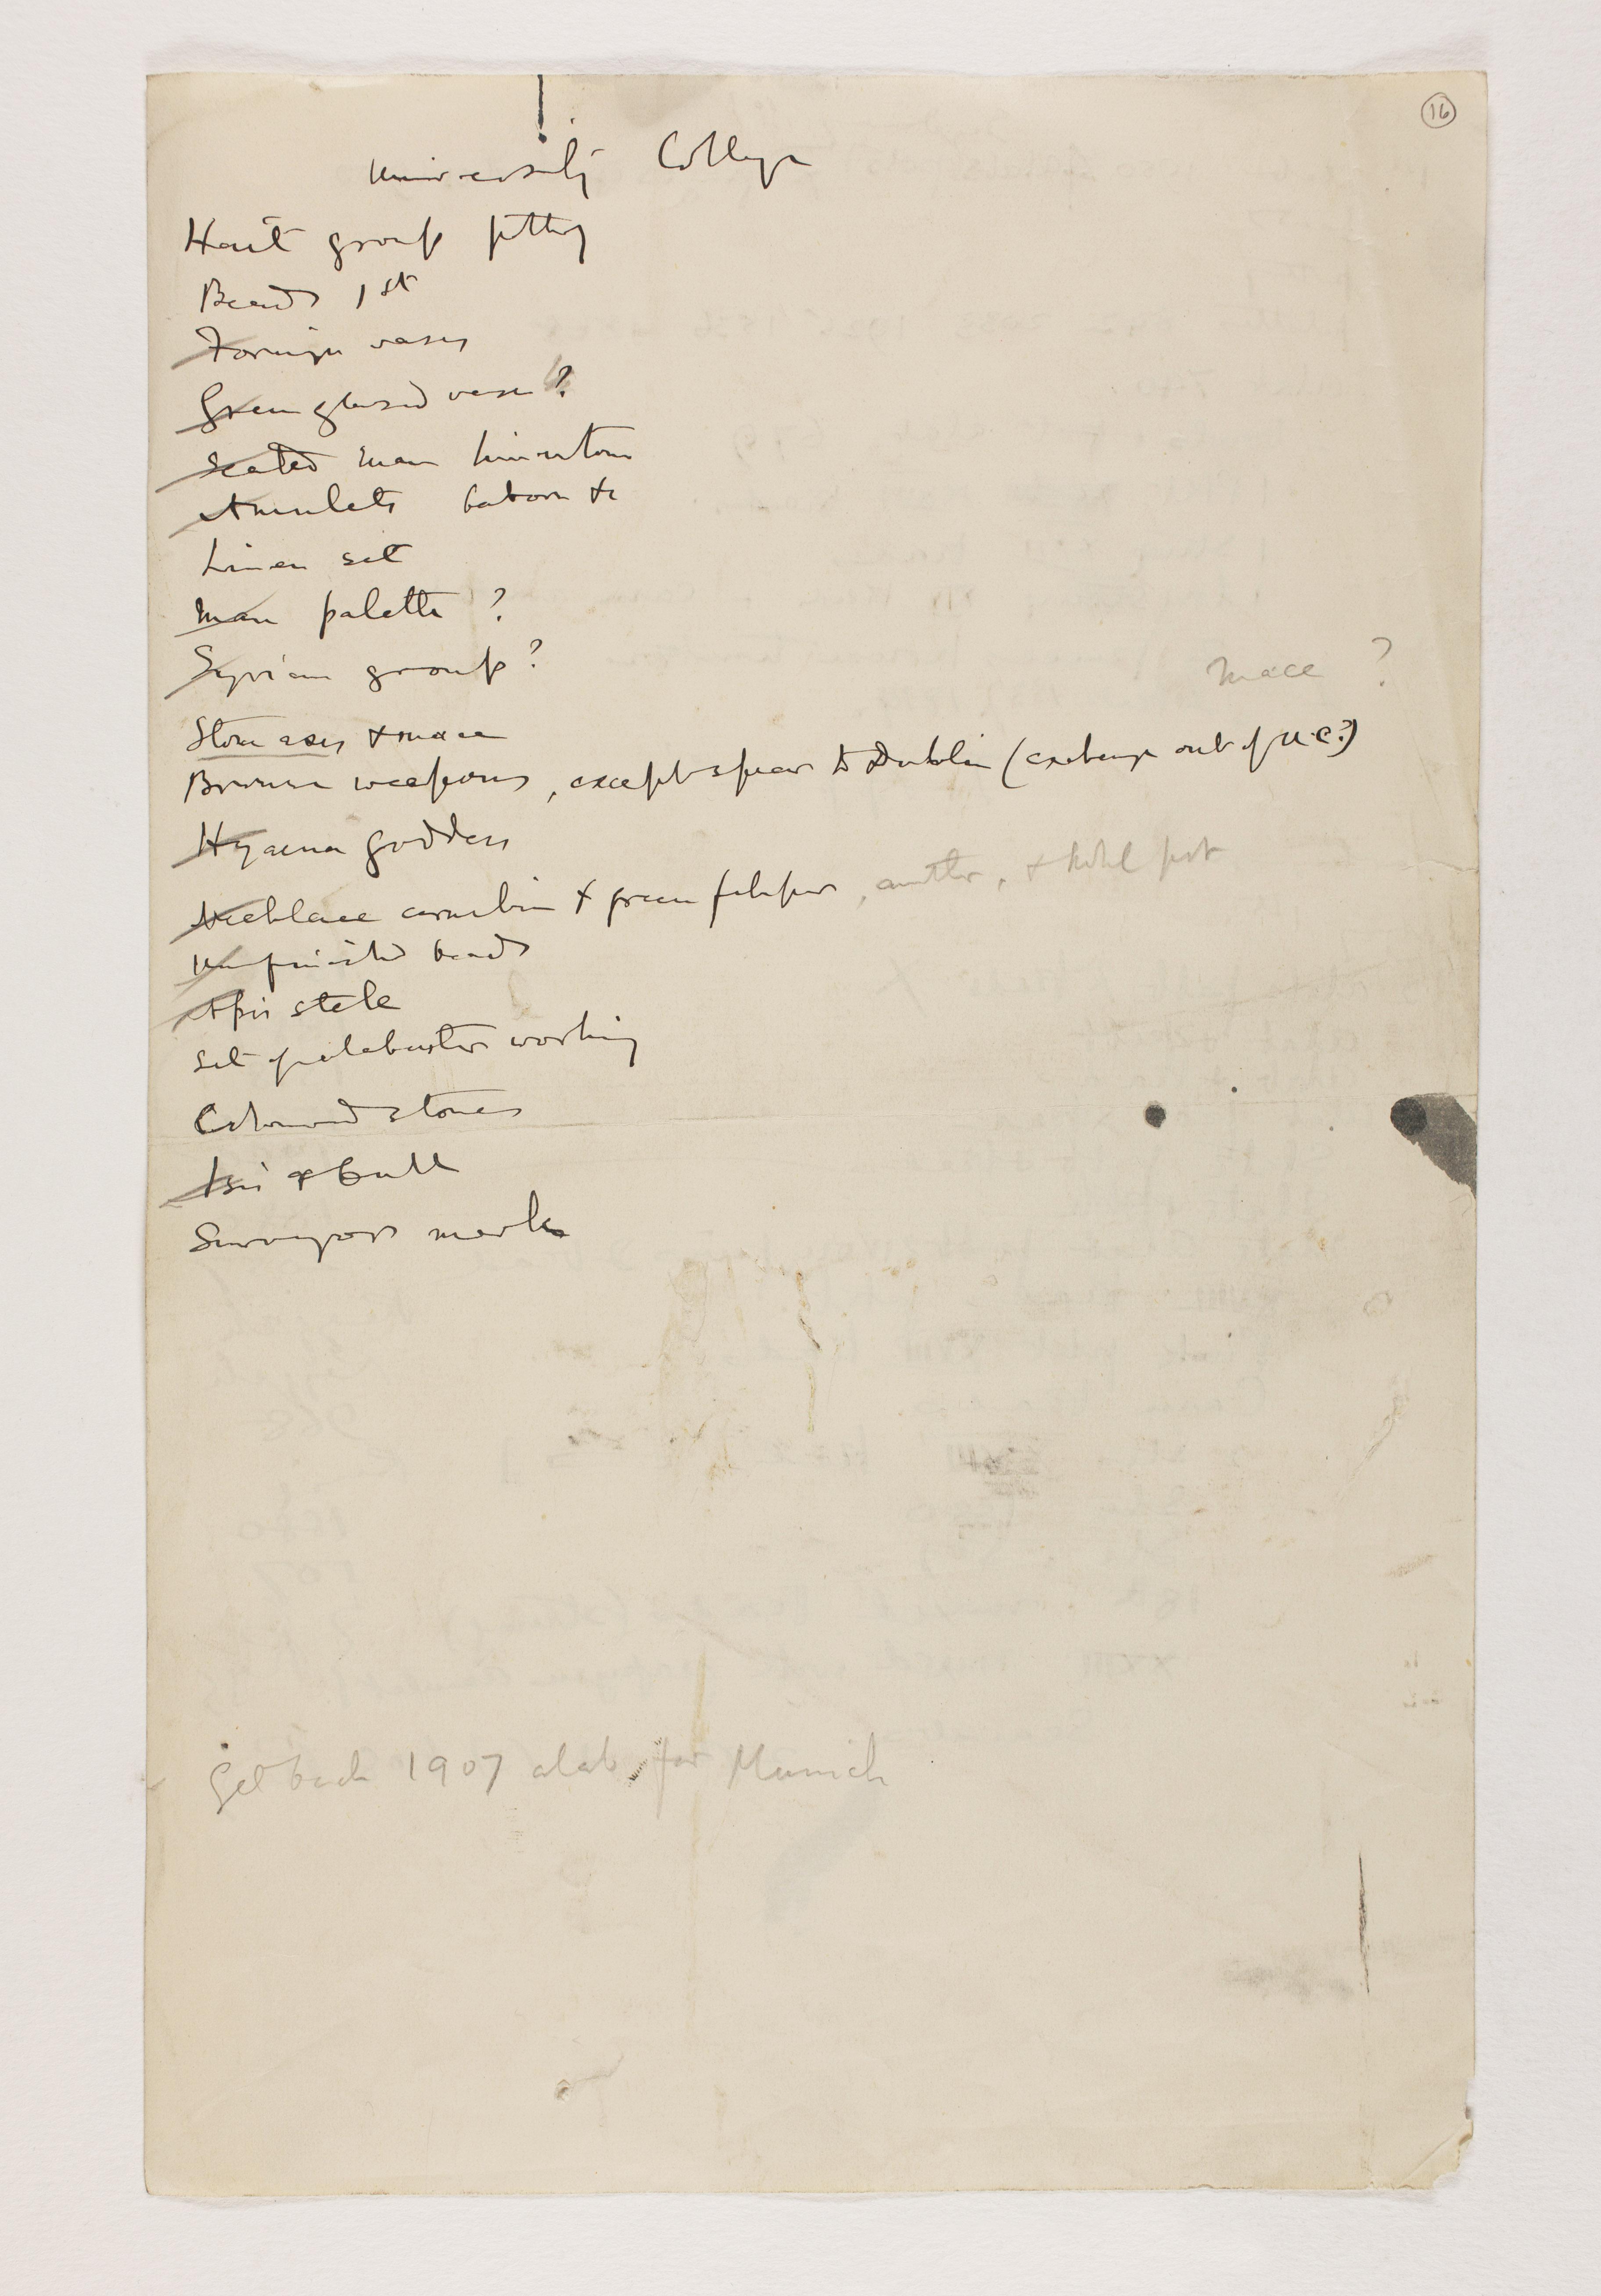 1912-13 Tarkhan, el-Riqqa, Memphis Multiple institution list PMA/WFP1/D/21/16.2